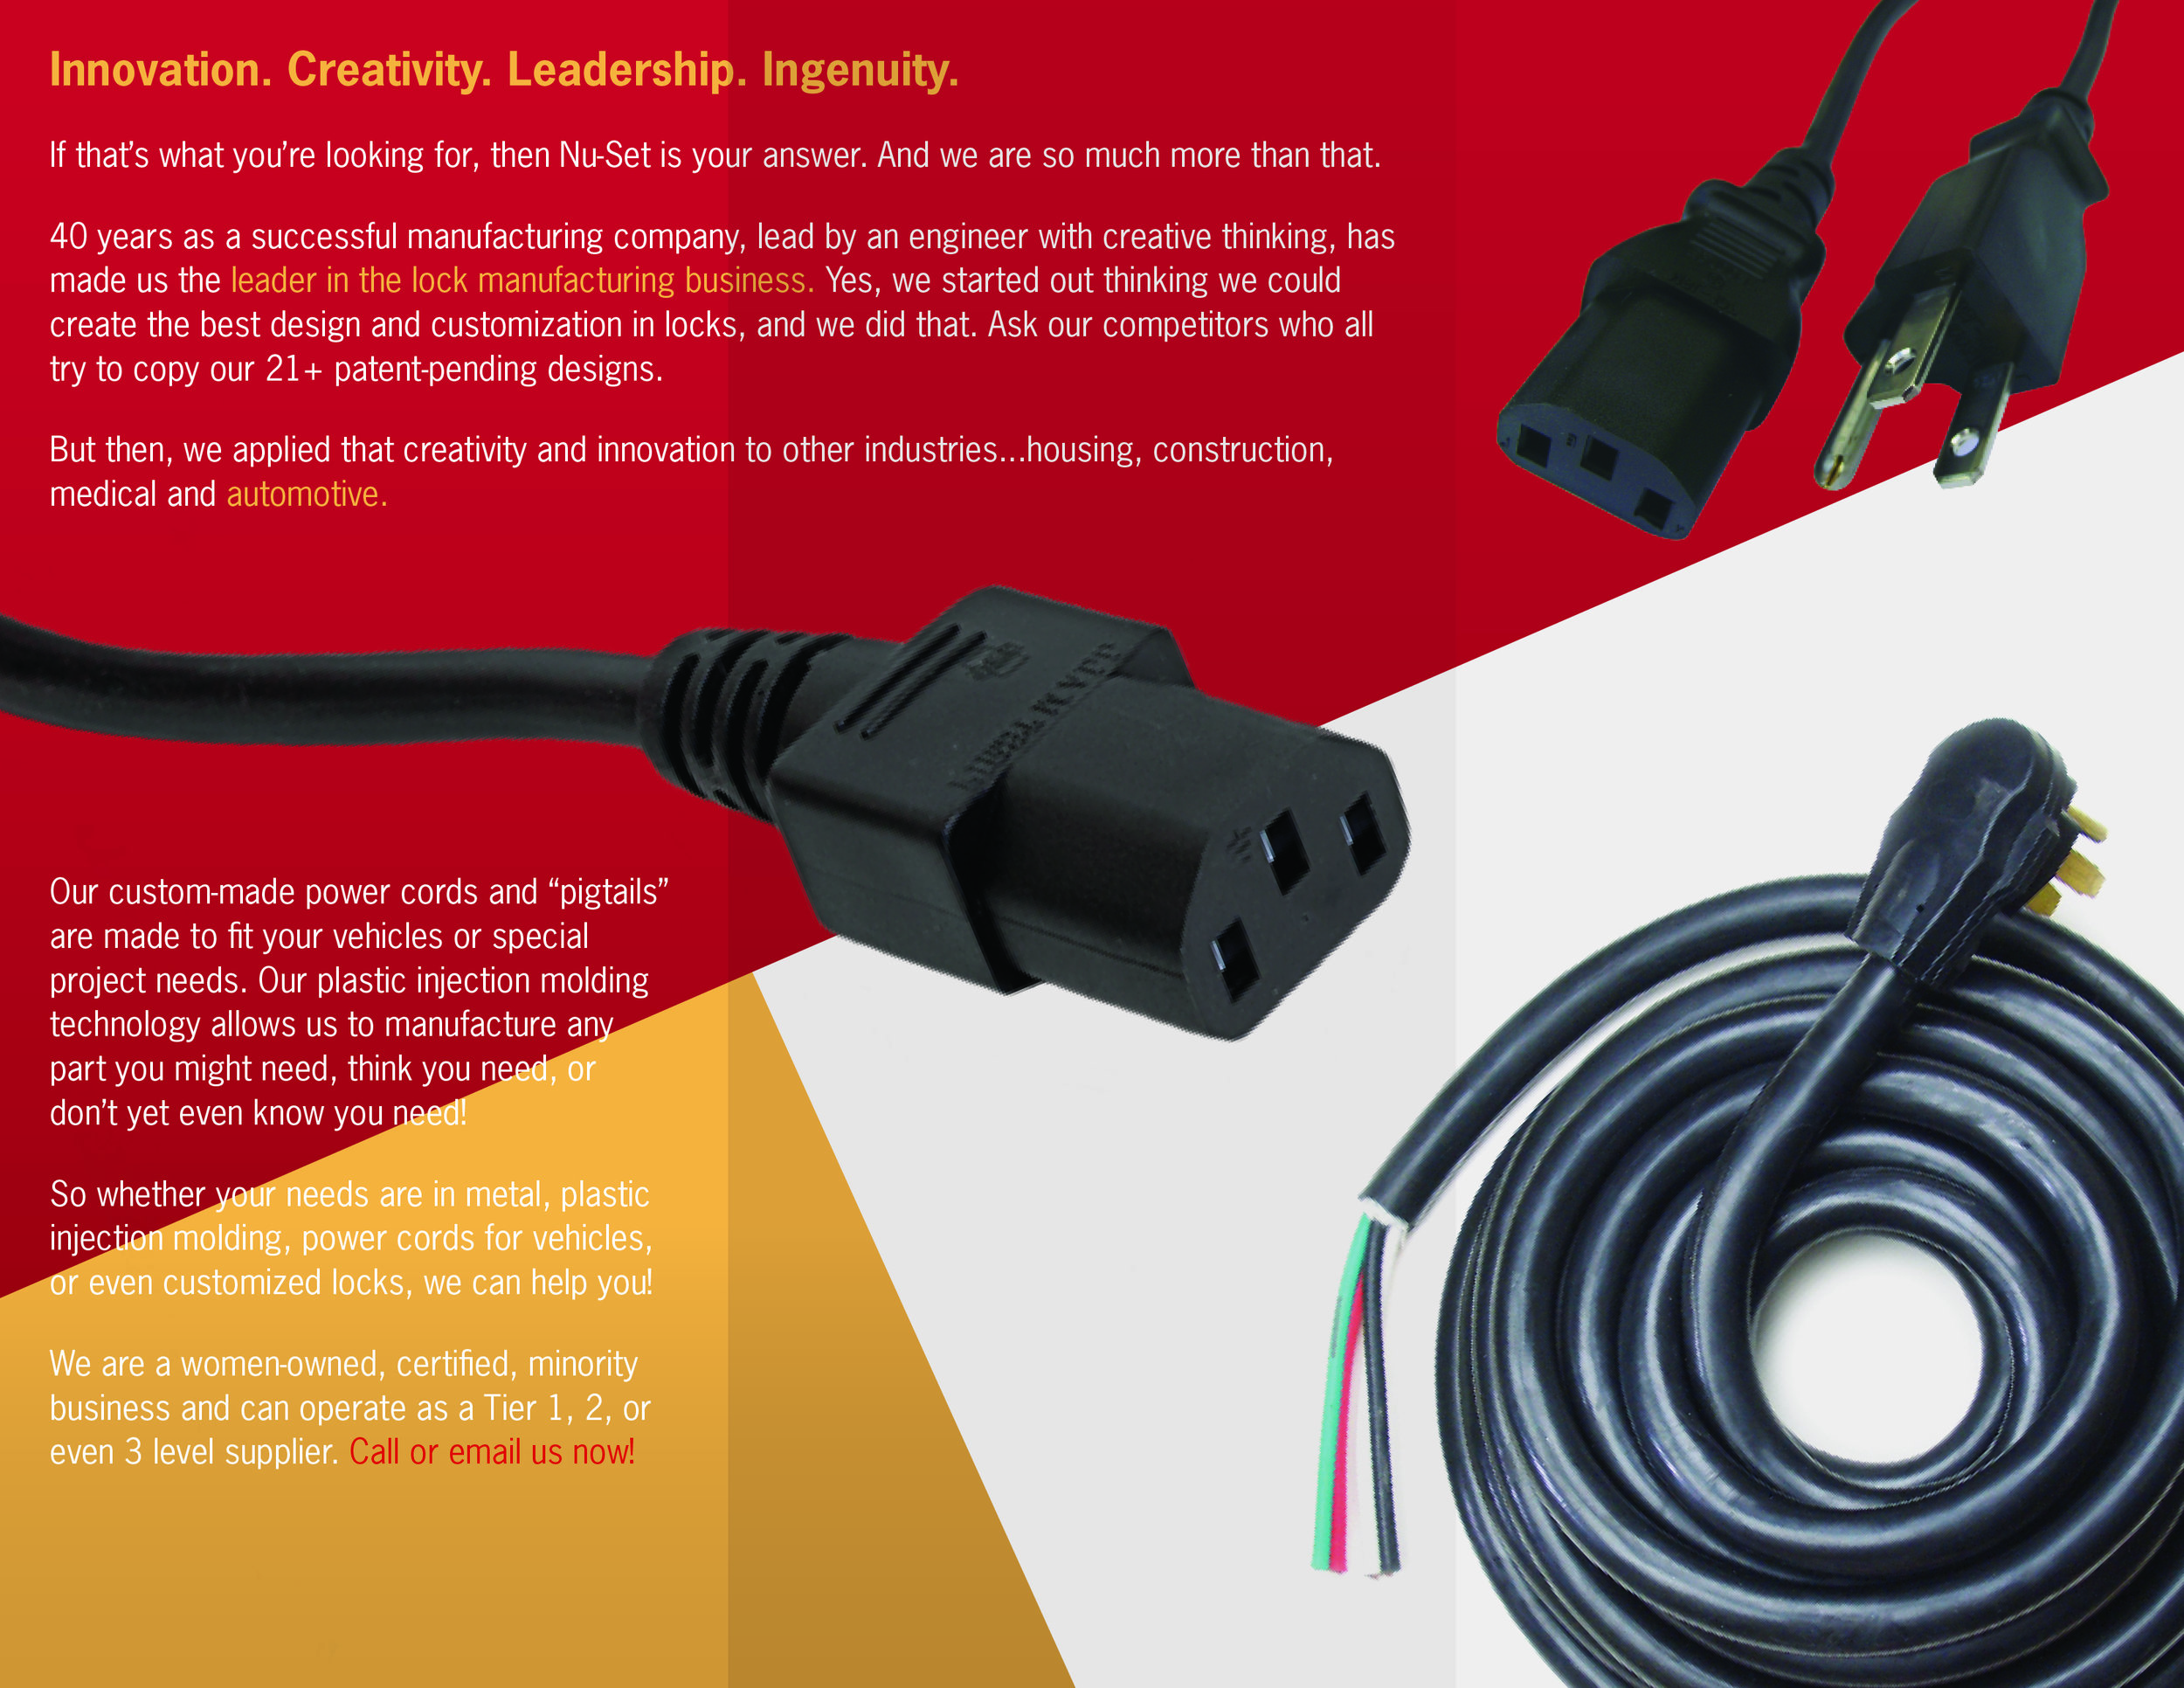 Toyota Conference Trifold Brochure |2014 -Automotive brochure (INSIDE)